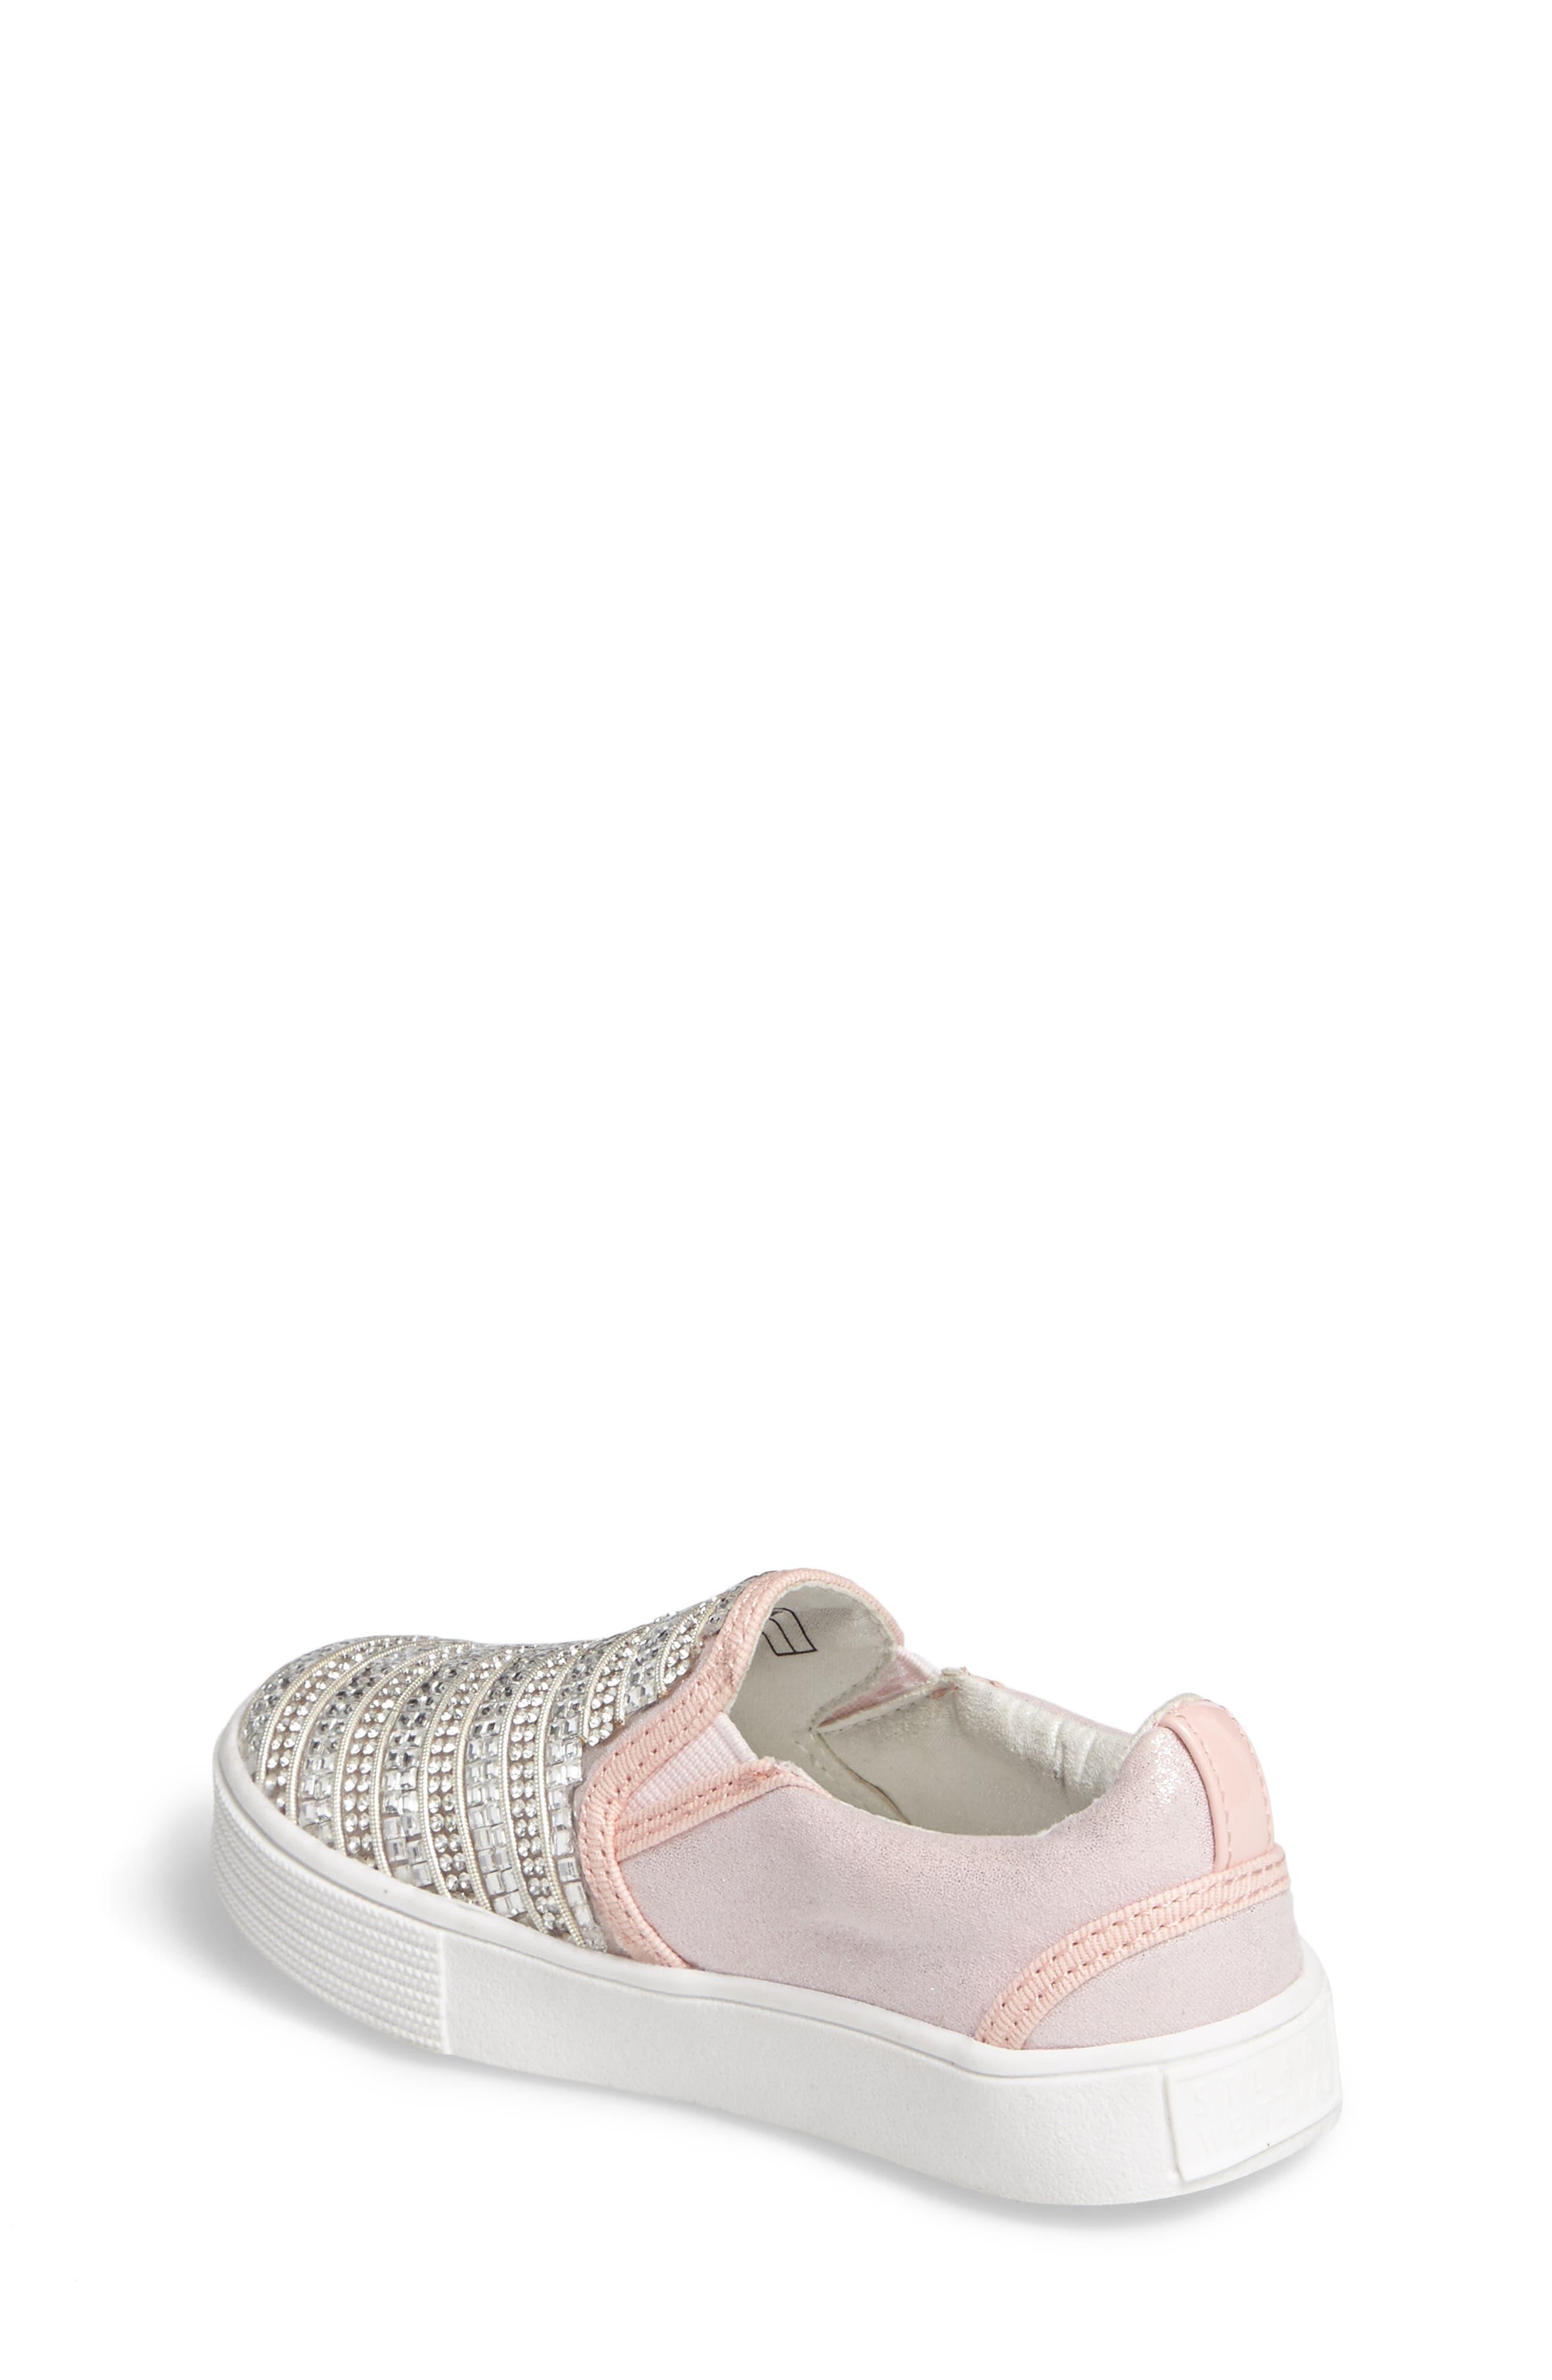 Alternate Image 2  - Stuart Weitzman Vance Glitz Slip-On Sneaker (Walker, Toddler, Little Kid & Big Kid)